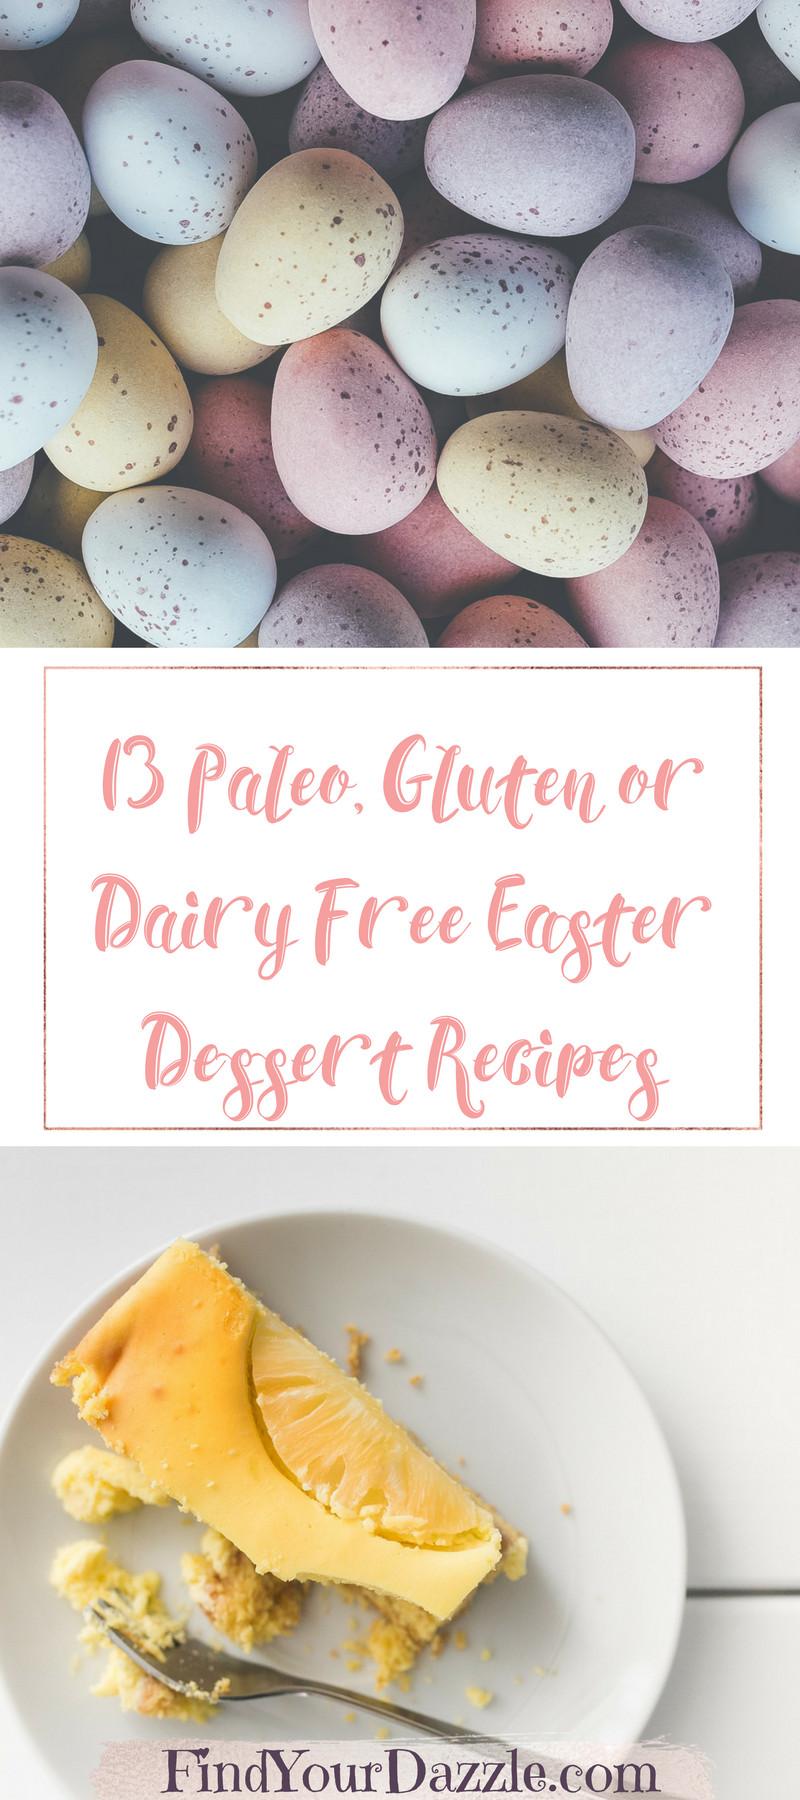 Gluten Free Easter Desserts  13 Paleo Gluten or Dairy Free Easter Dessert Recipes